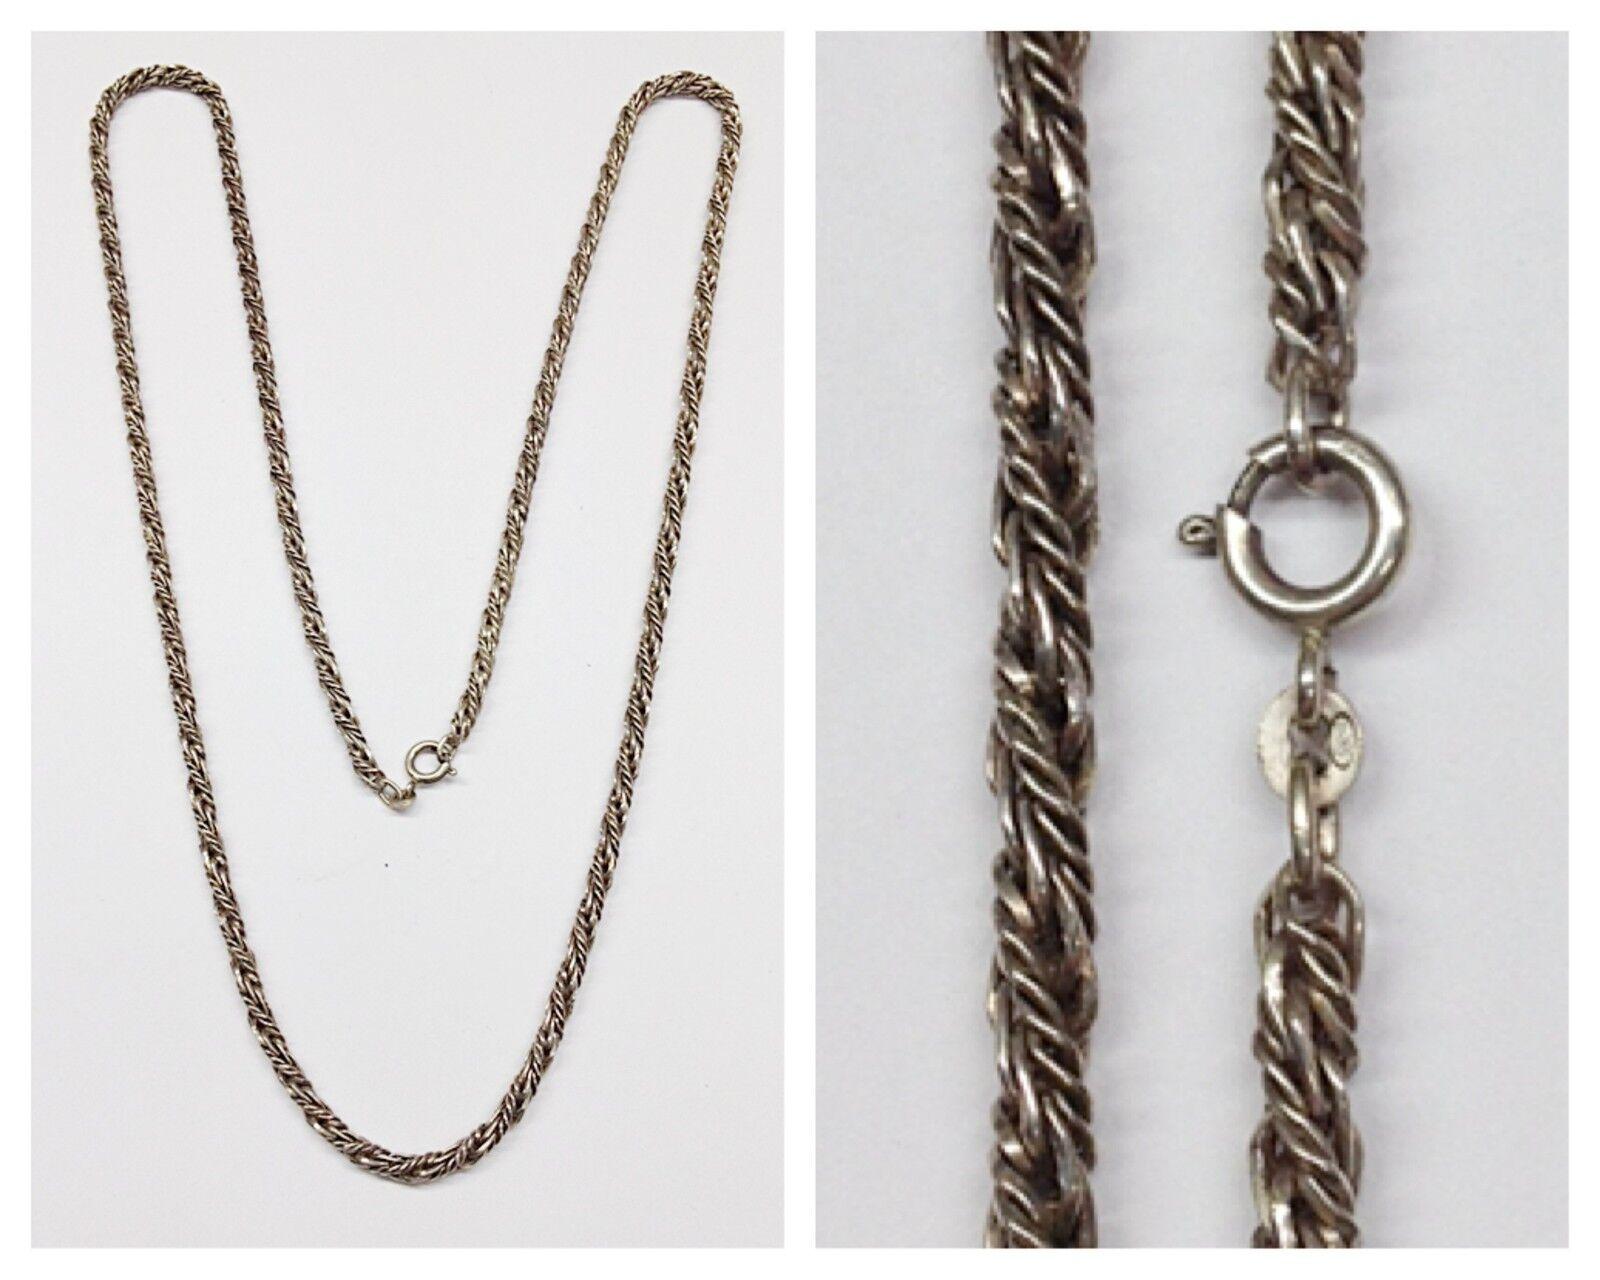 Cadena de silver 835 Cadena de silver collar de silver collar joyería silver L 80cm